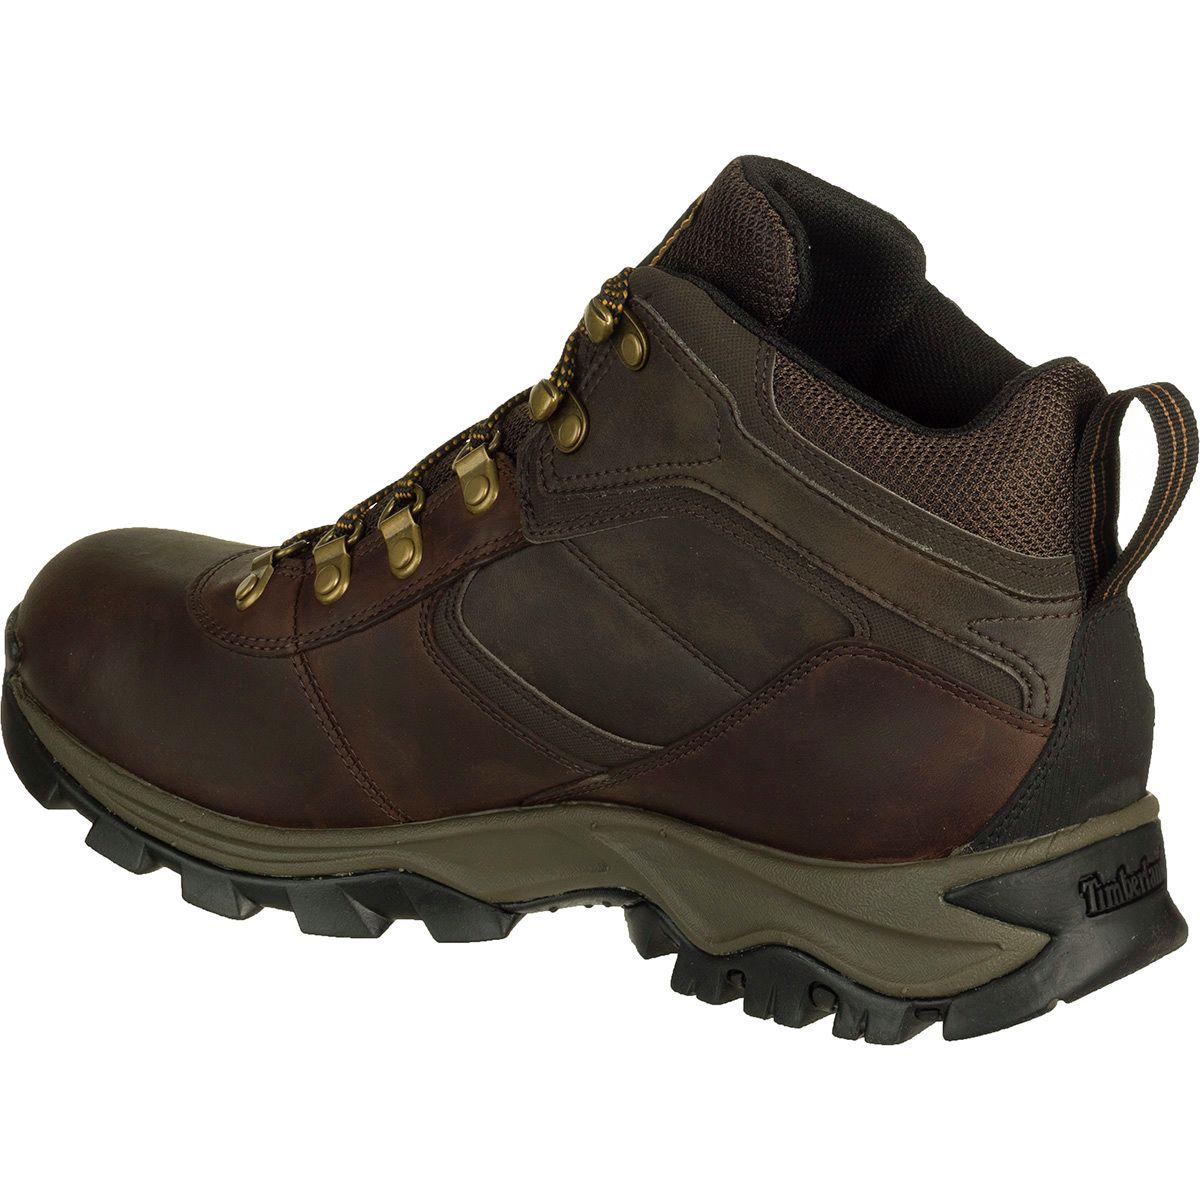 thumbnail 14 - Timberland Mt. Maddsen Mid Waterproof Hiking Boot - Men's